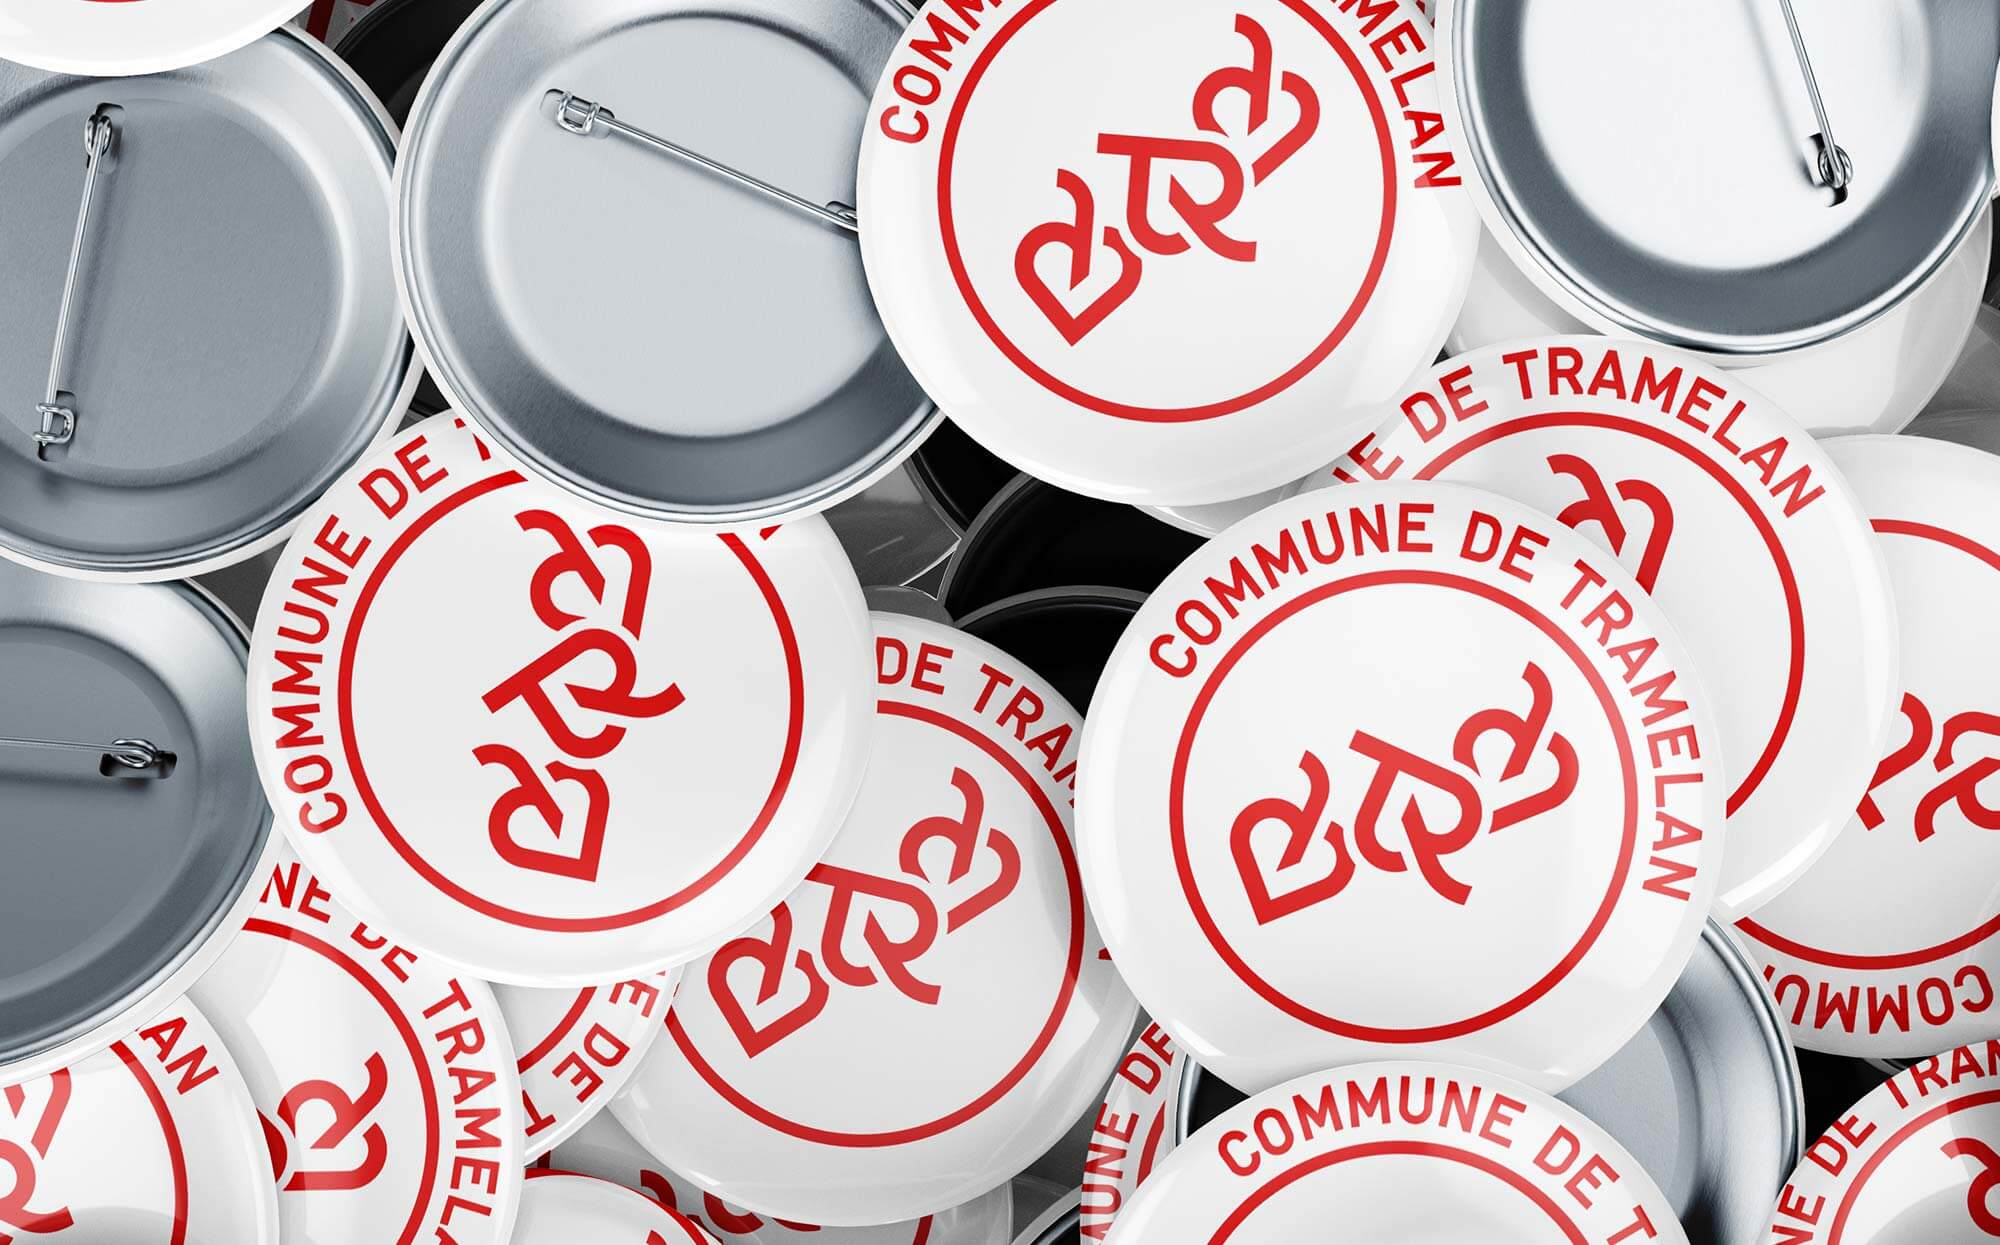 Badges commune de Tramelan